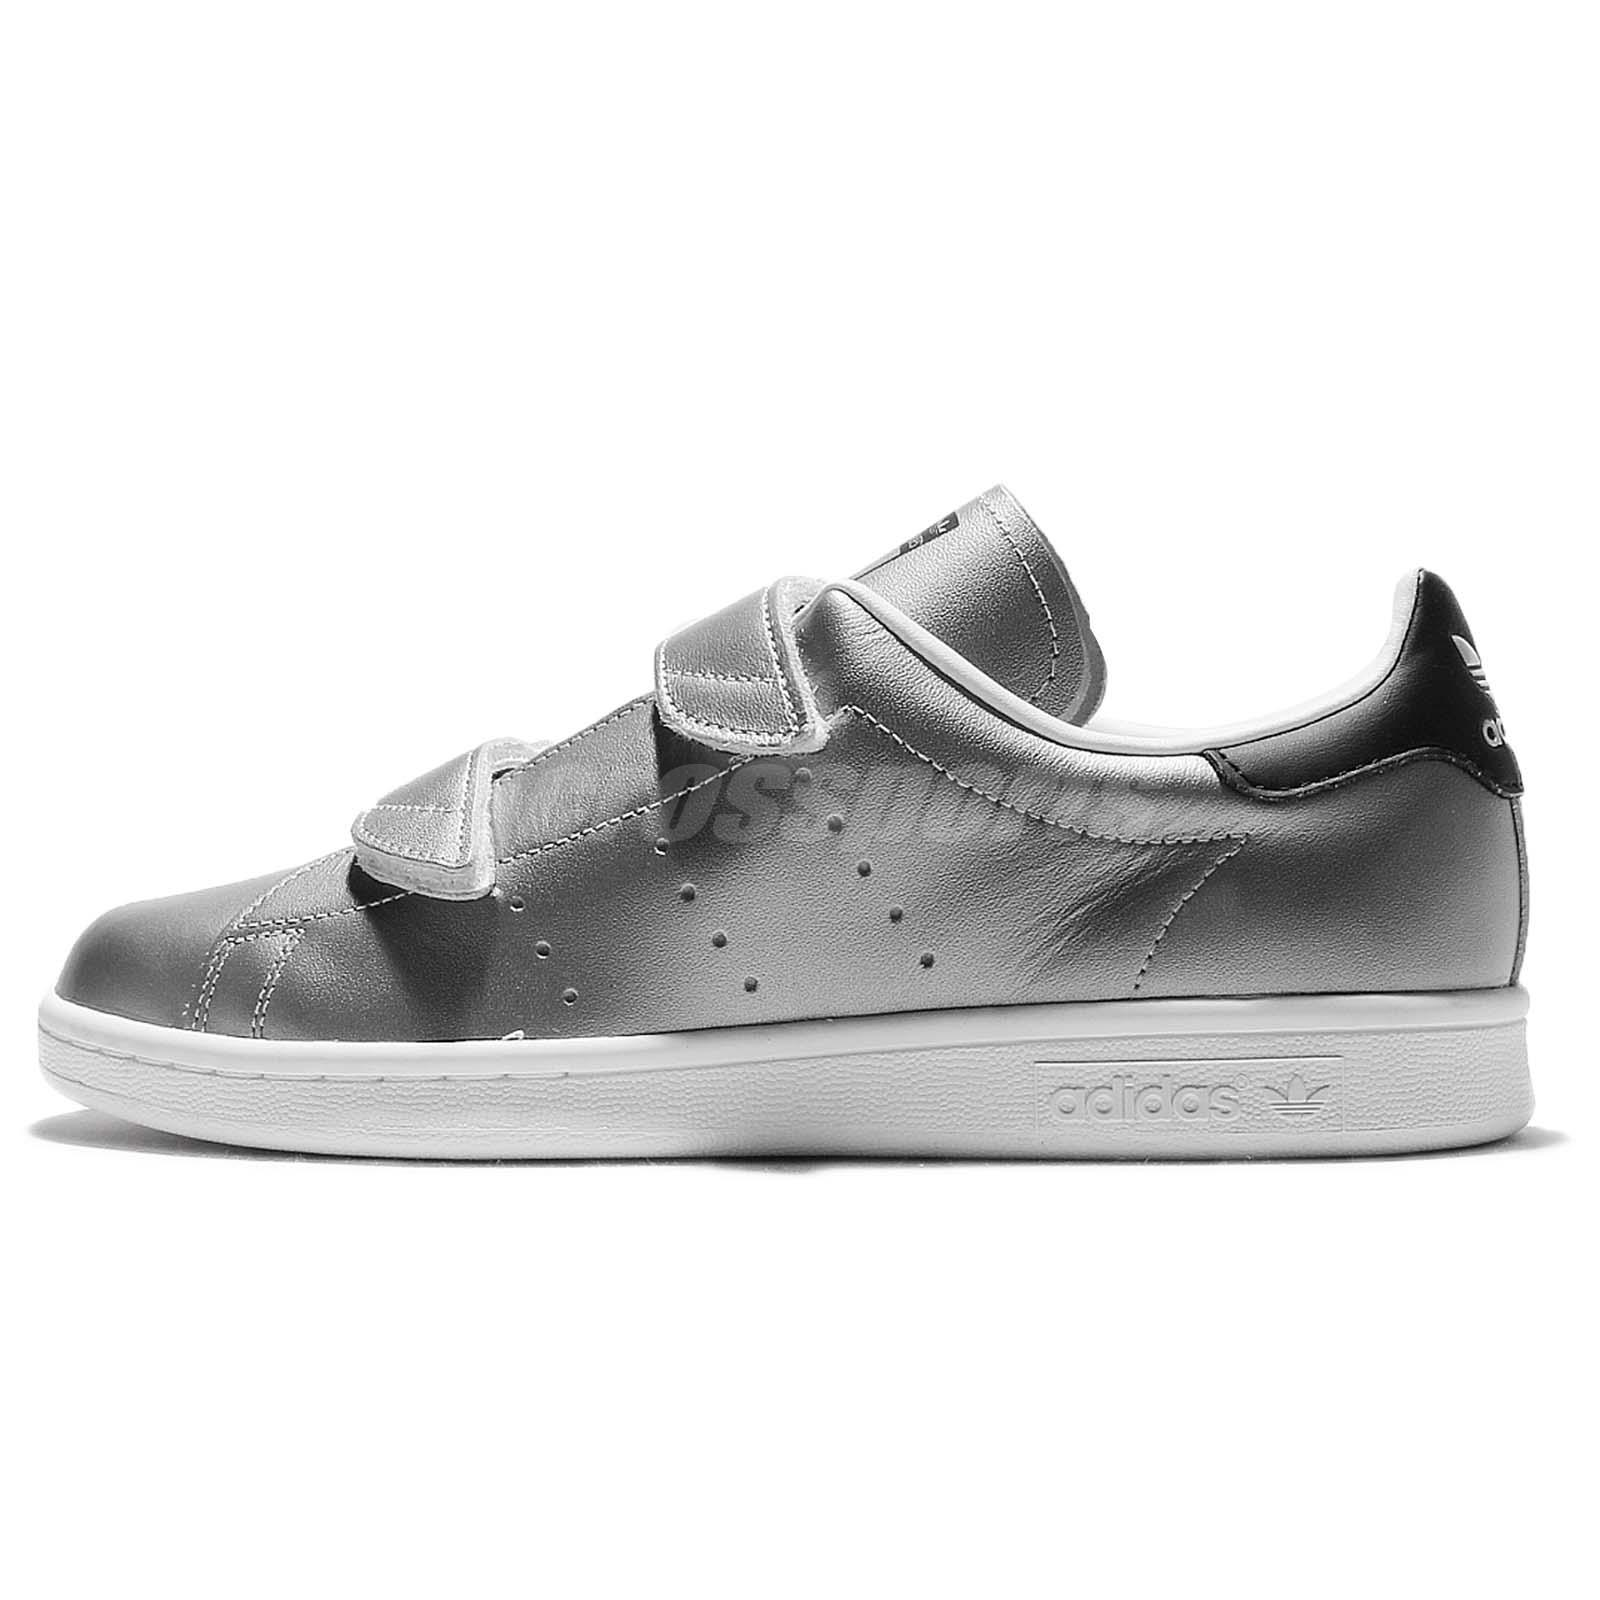 38feaea6b3b7 Amazon Com Adidas Originals Mens Stan Smith Shoes Fashion Sneakers